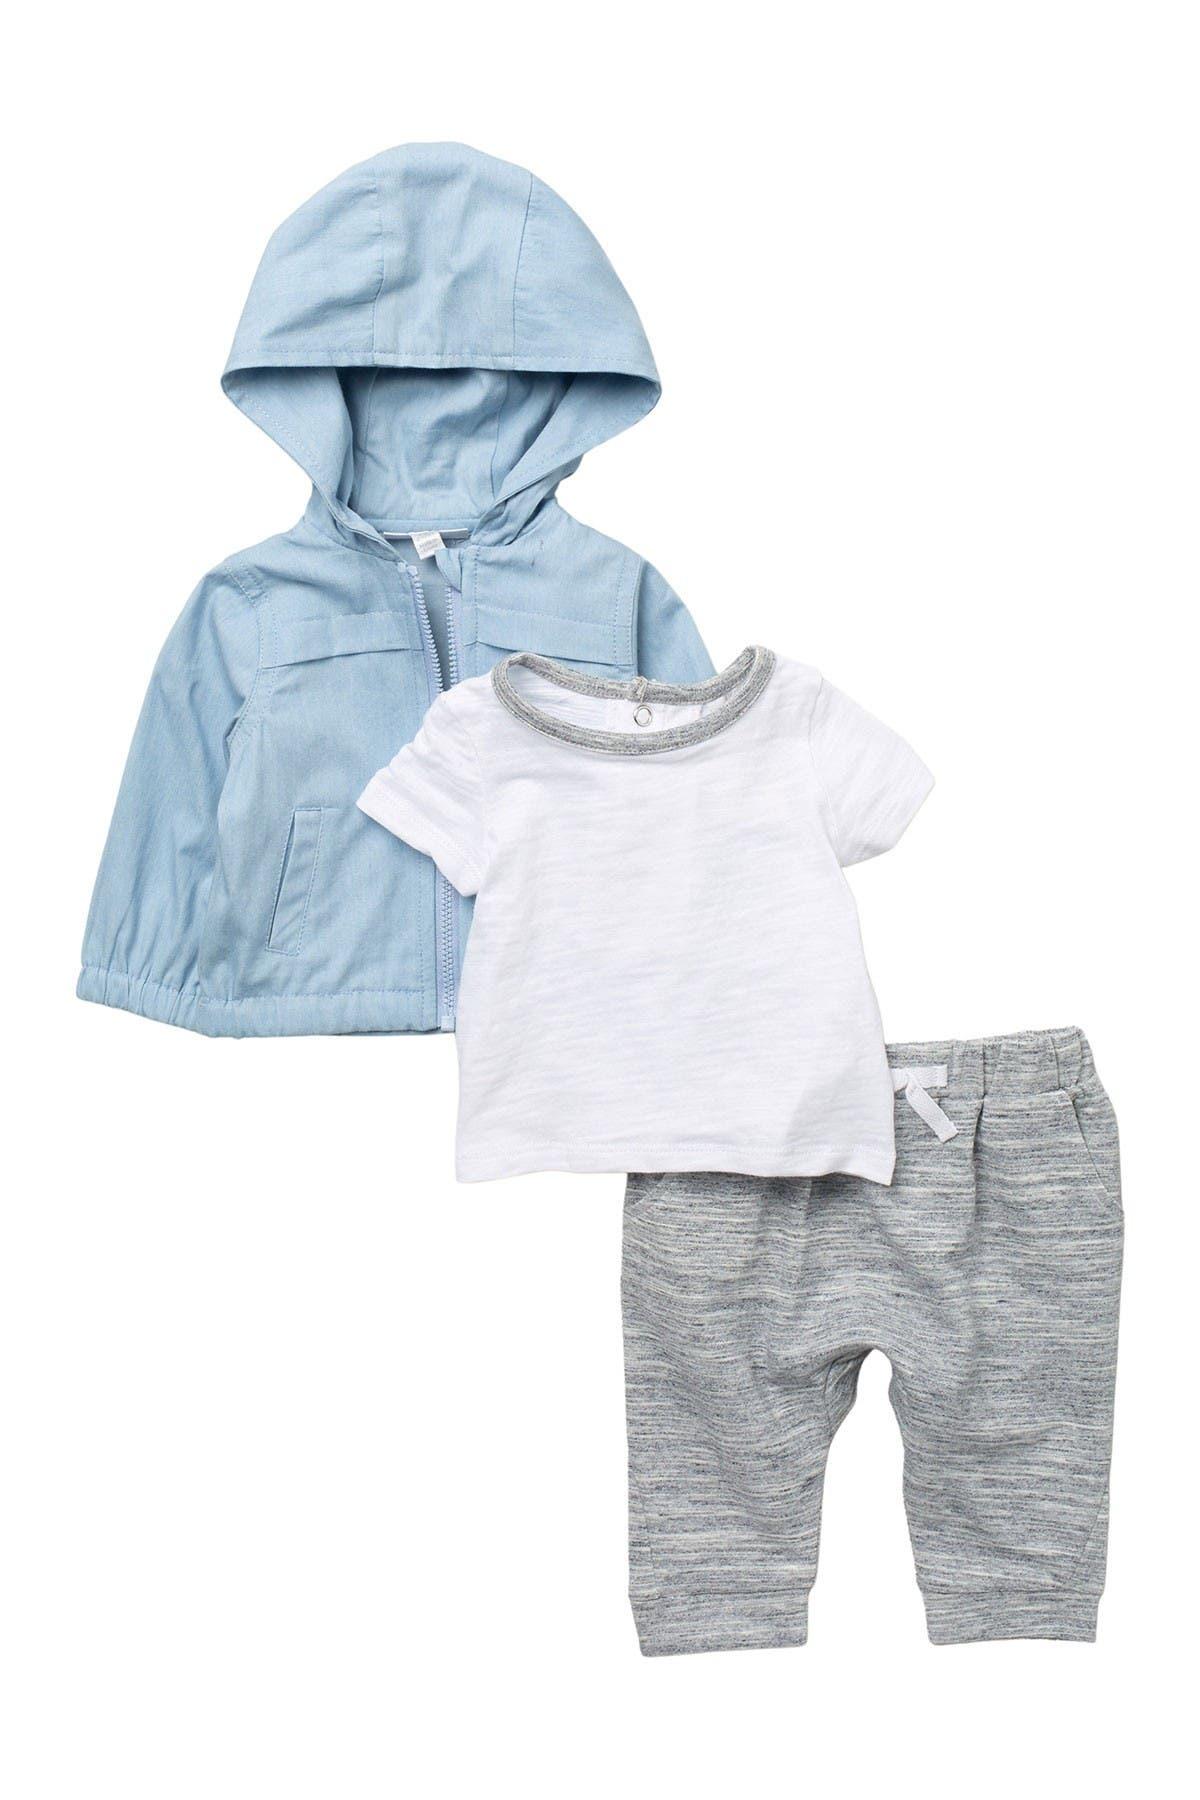 Image of Miniclasix Hooded Jacket, T-Shirt, & Joggers Set